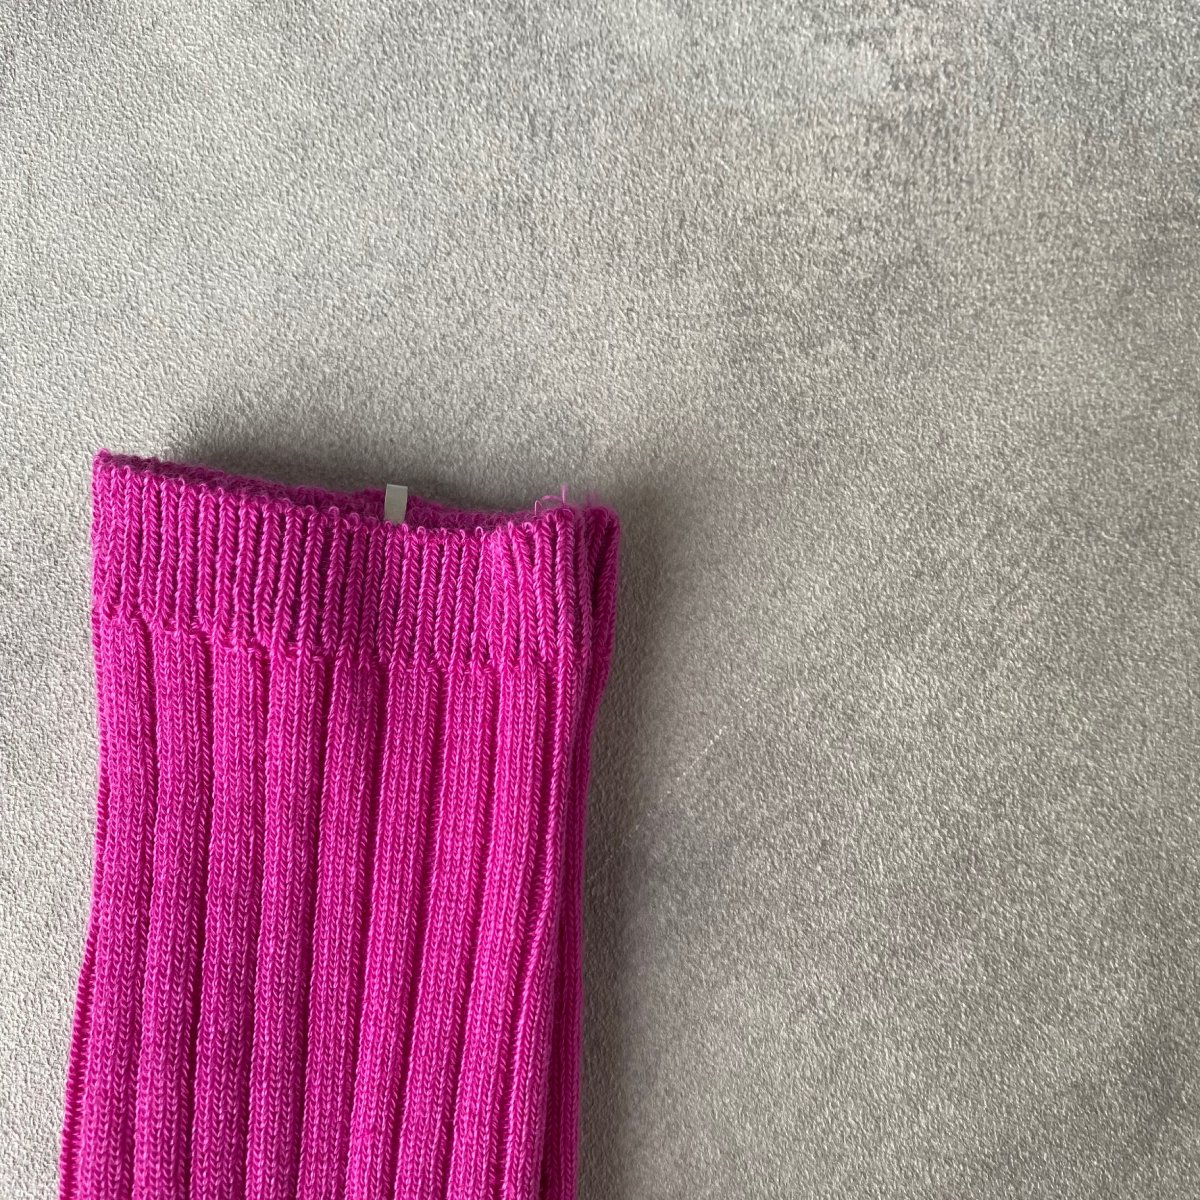 【BABY】Neon Socks 詳細画像18